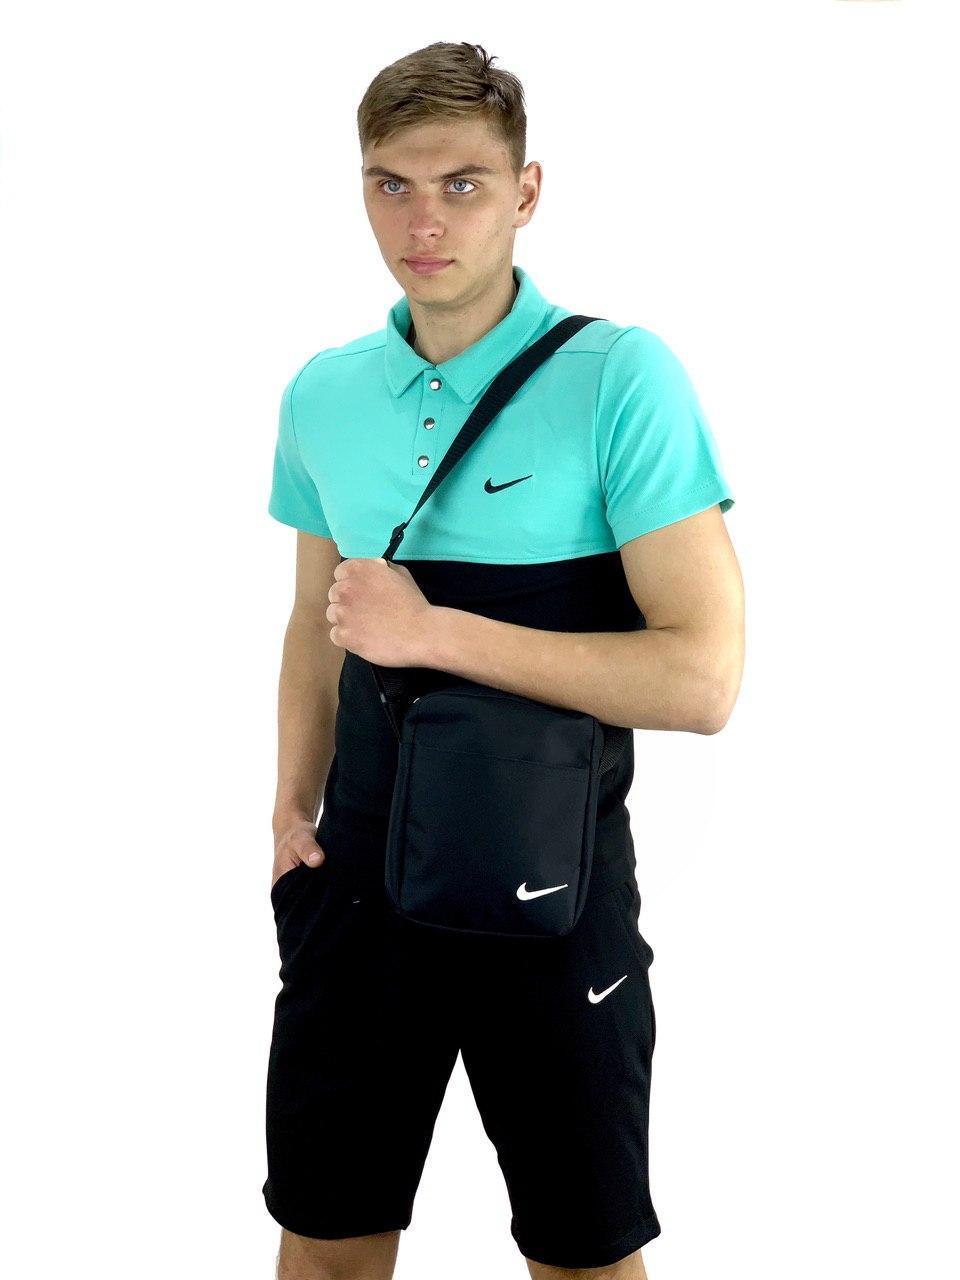 Футболка Поло черная-бирюзовая + Шорты+ Барсетка Nike (Найк) Костюм в стиле Nike летний